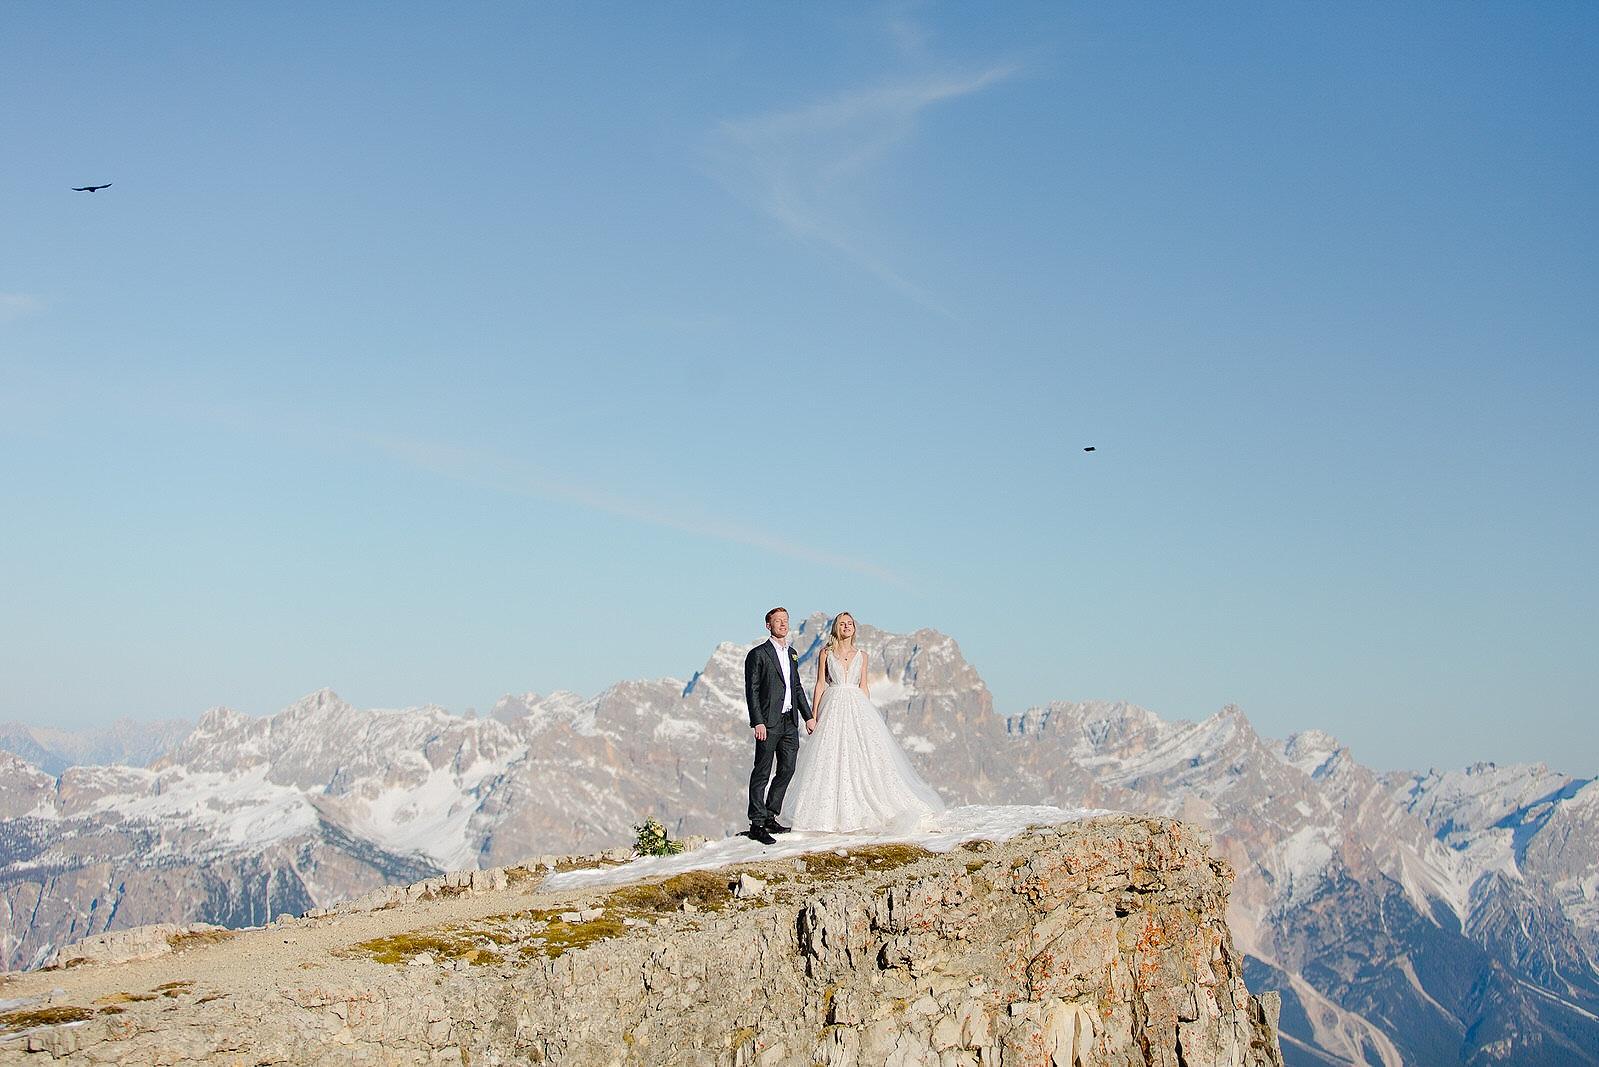 Adventurous+Dolomites+Elopement+Wedding+Fotomagoria42.jpg